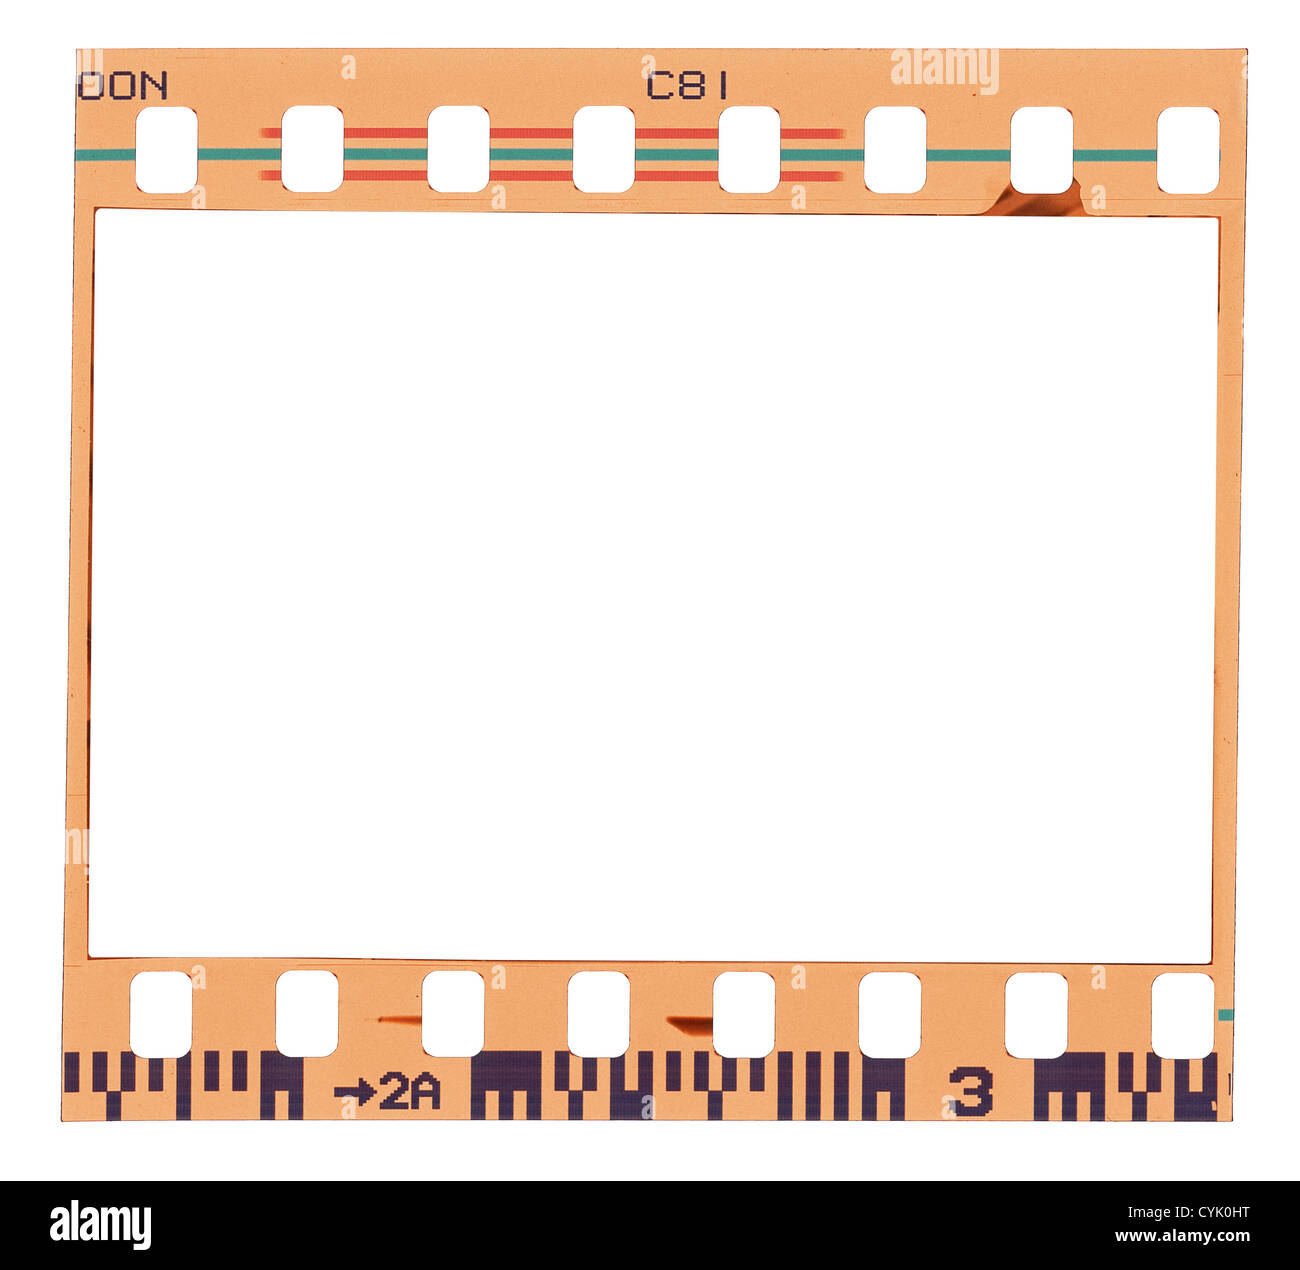 Blank color film strip frame Stock Photo: 51434036 - Alamy